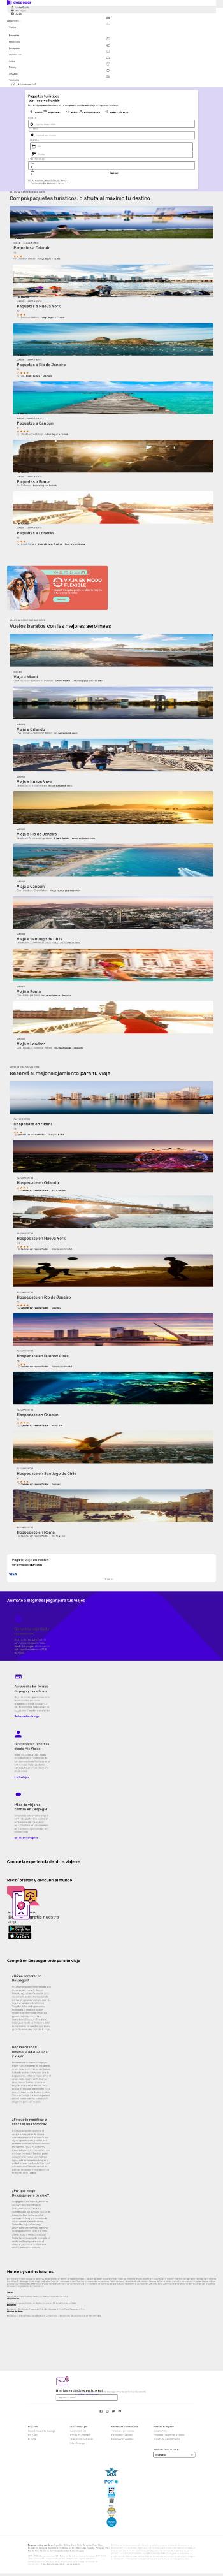 Despegar.com, Corp. Website Screenshot